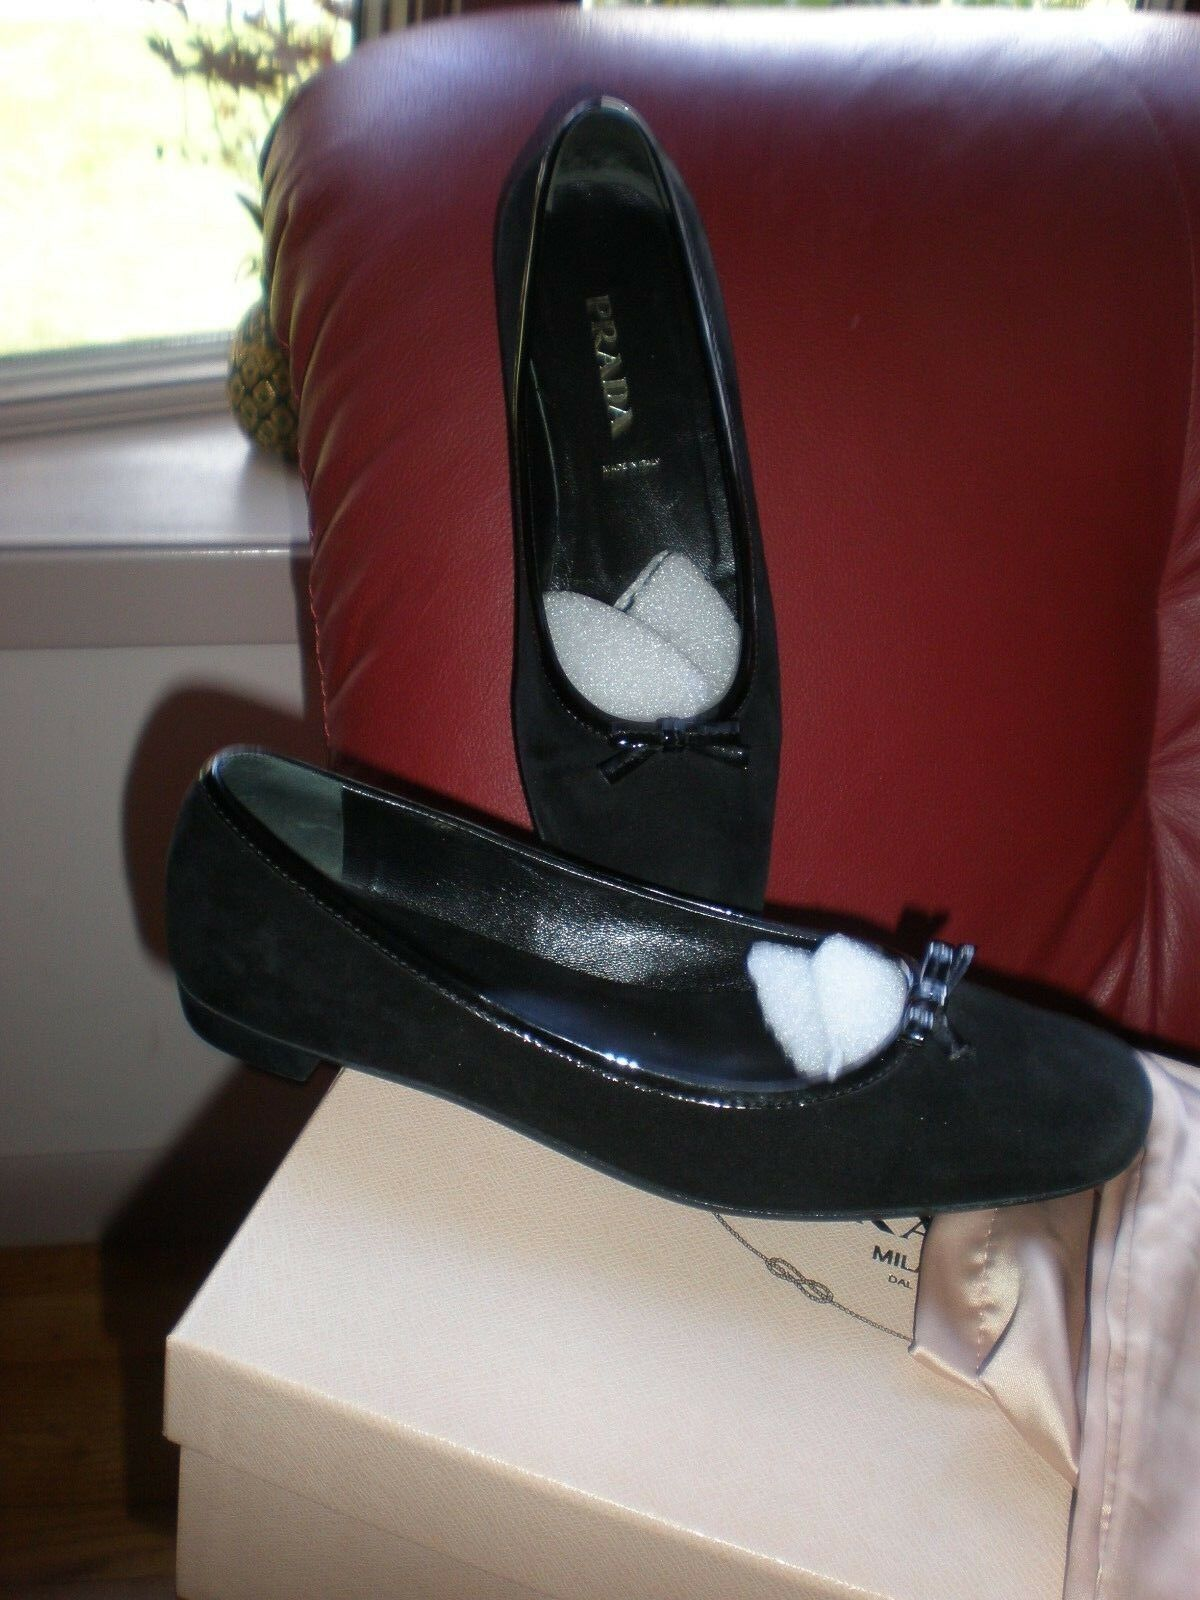 Prada Zapatos Gamuza Tacón Bajo Bajo Bajo Bailarina con poco arco-negro talla 36 Bombas De Pisos  buscando agente de ventas